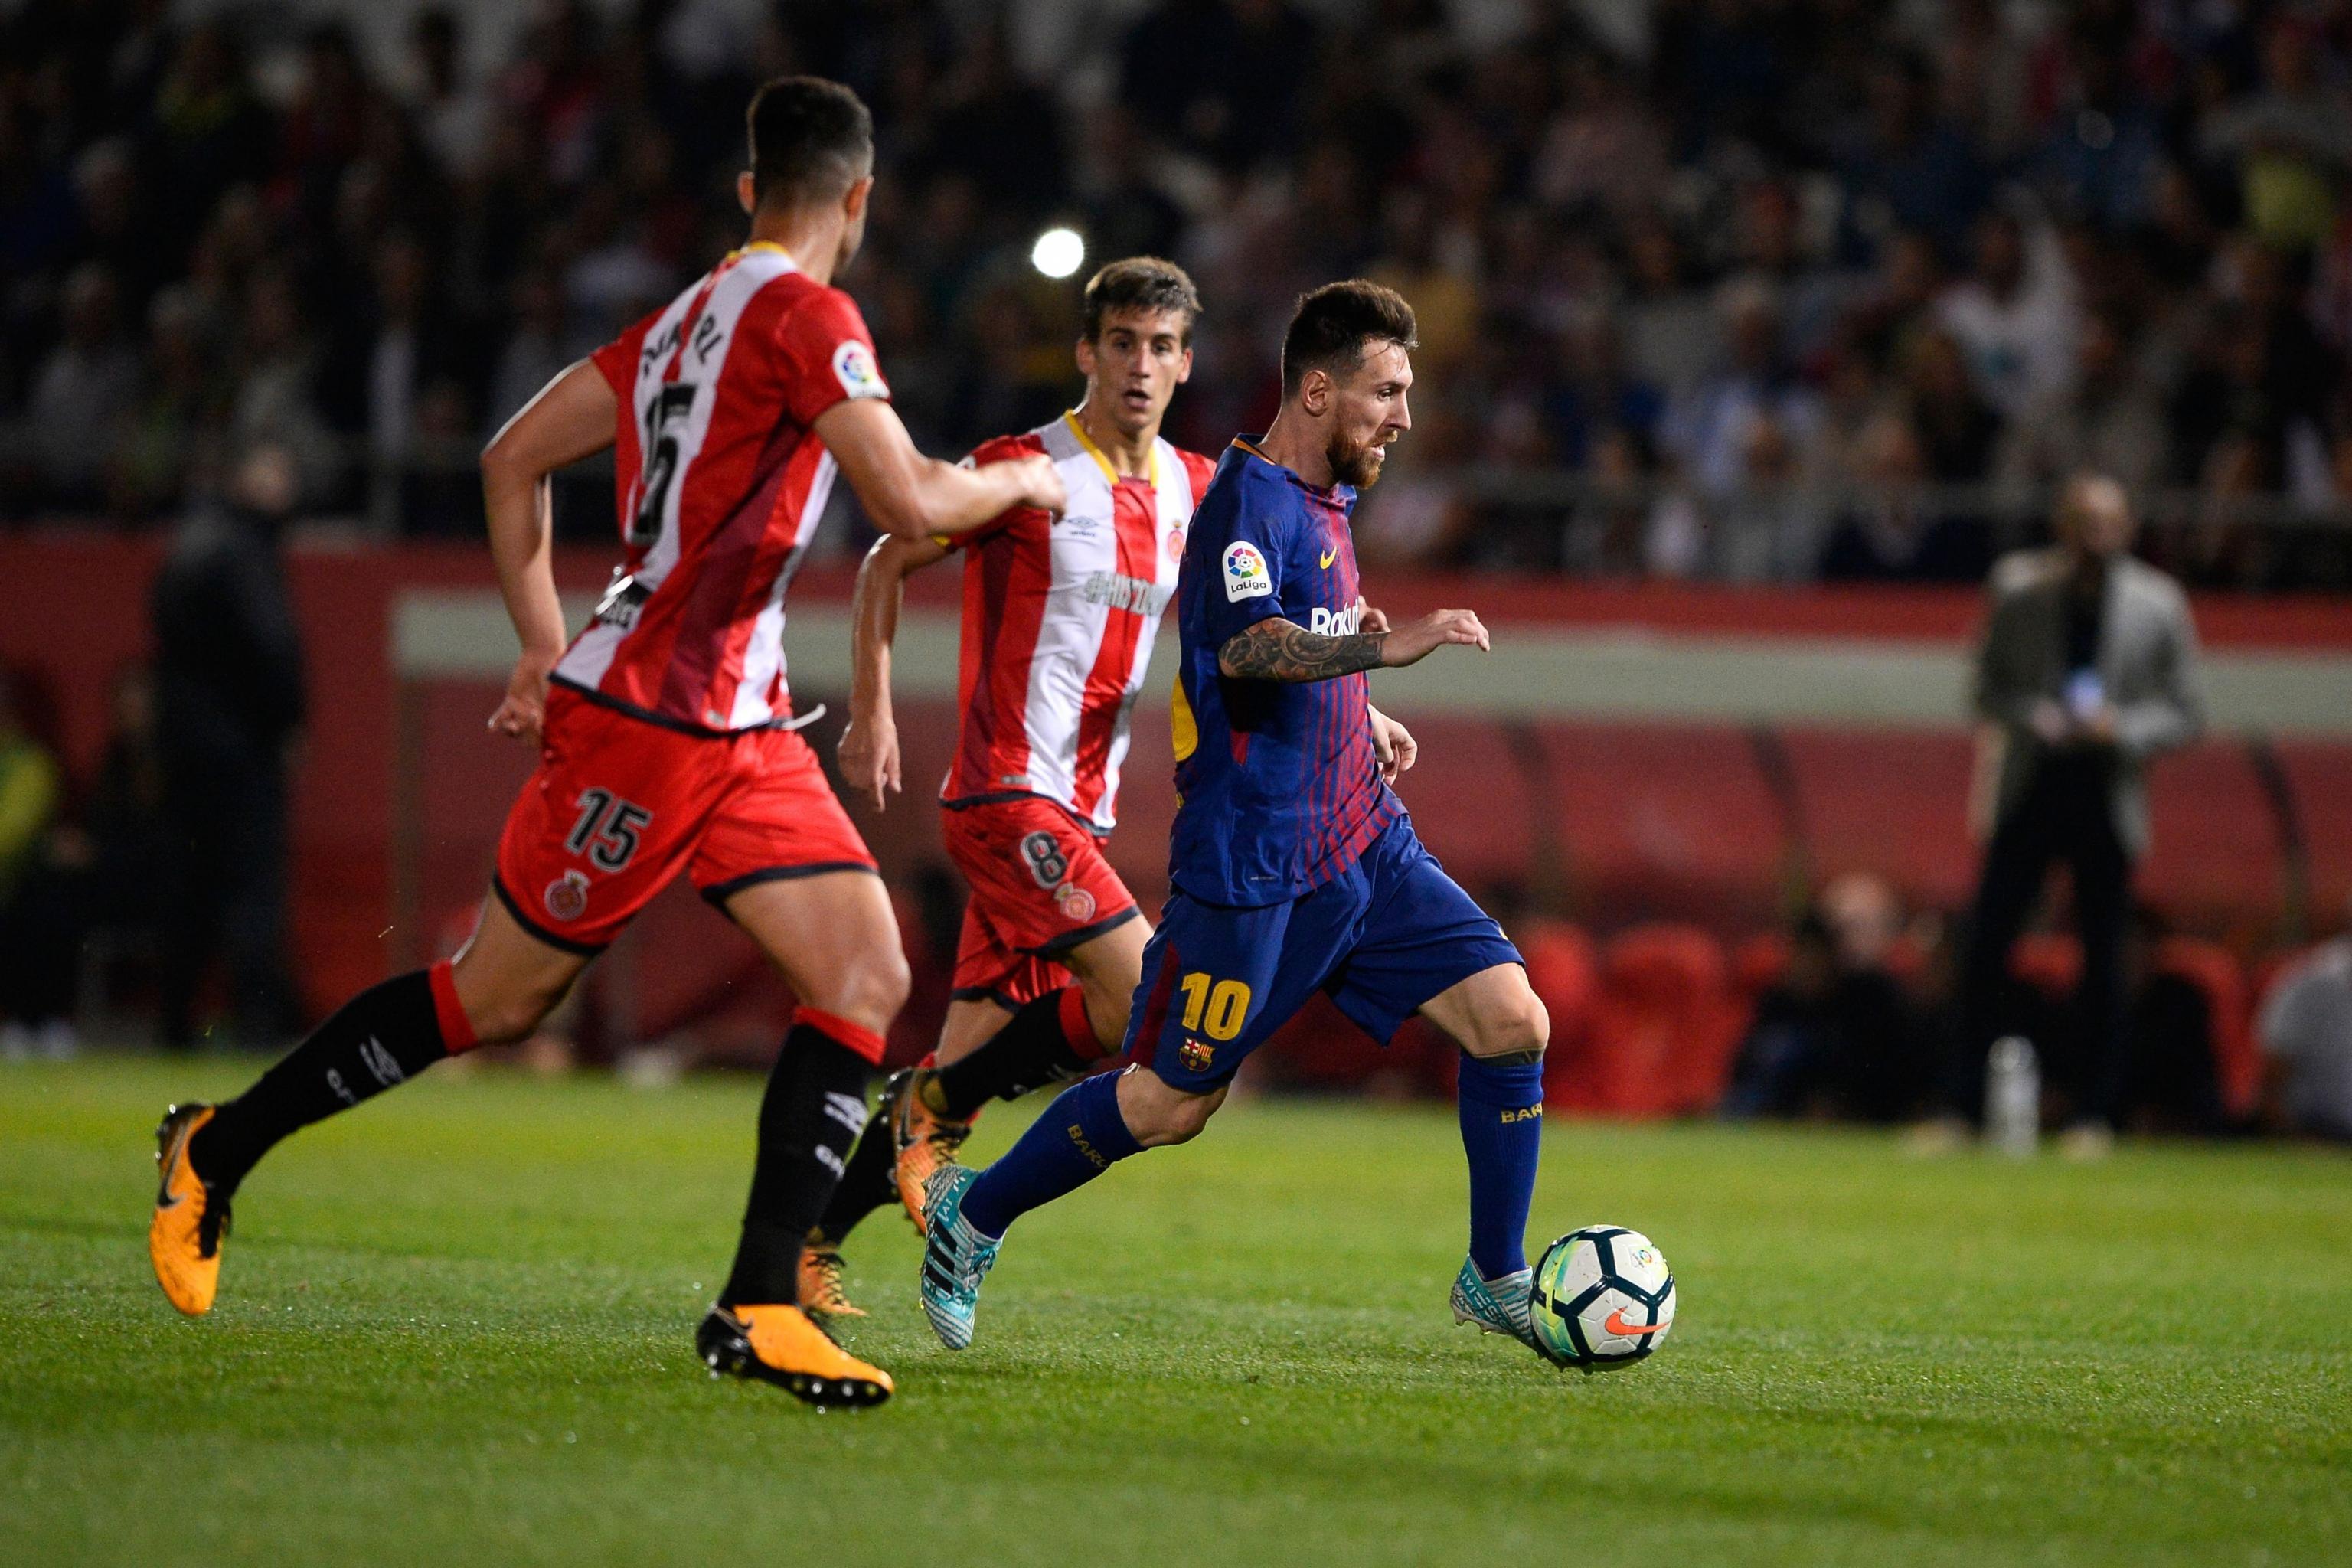 Barcelona Vs Girona Team News Preview Live Stream Tv Info Bleacher Report Latest News Videos And Highlights